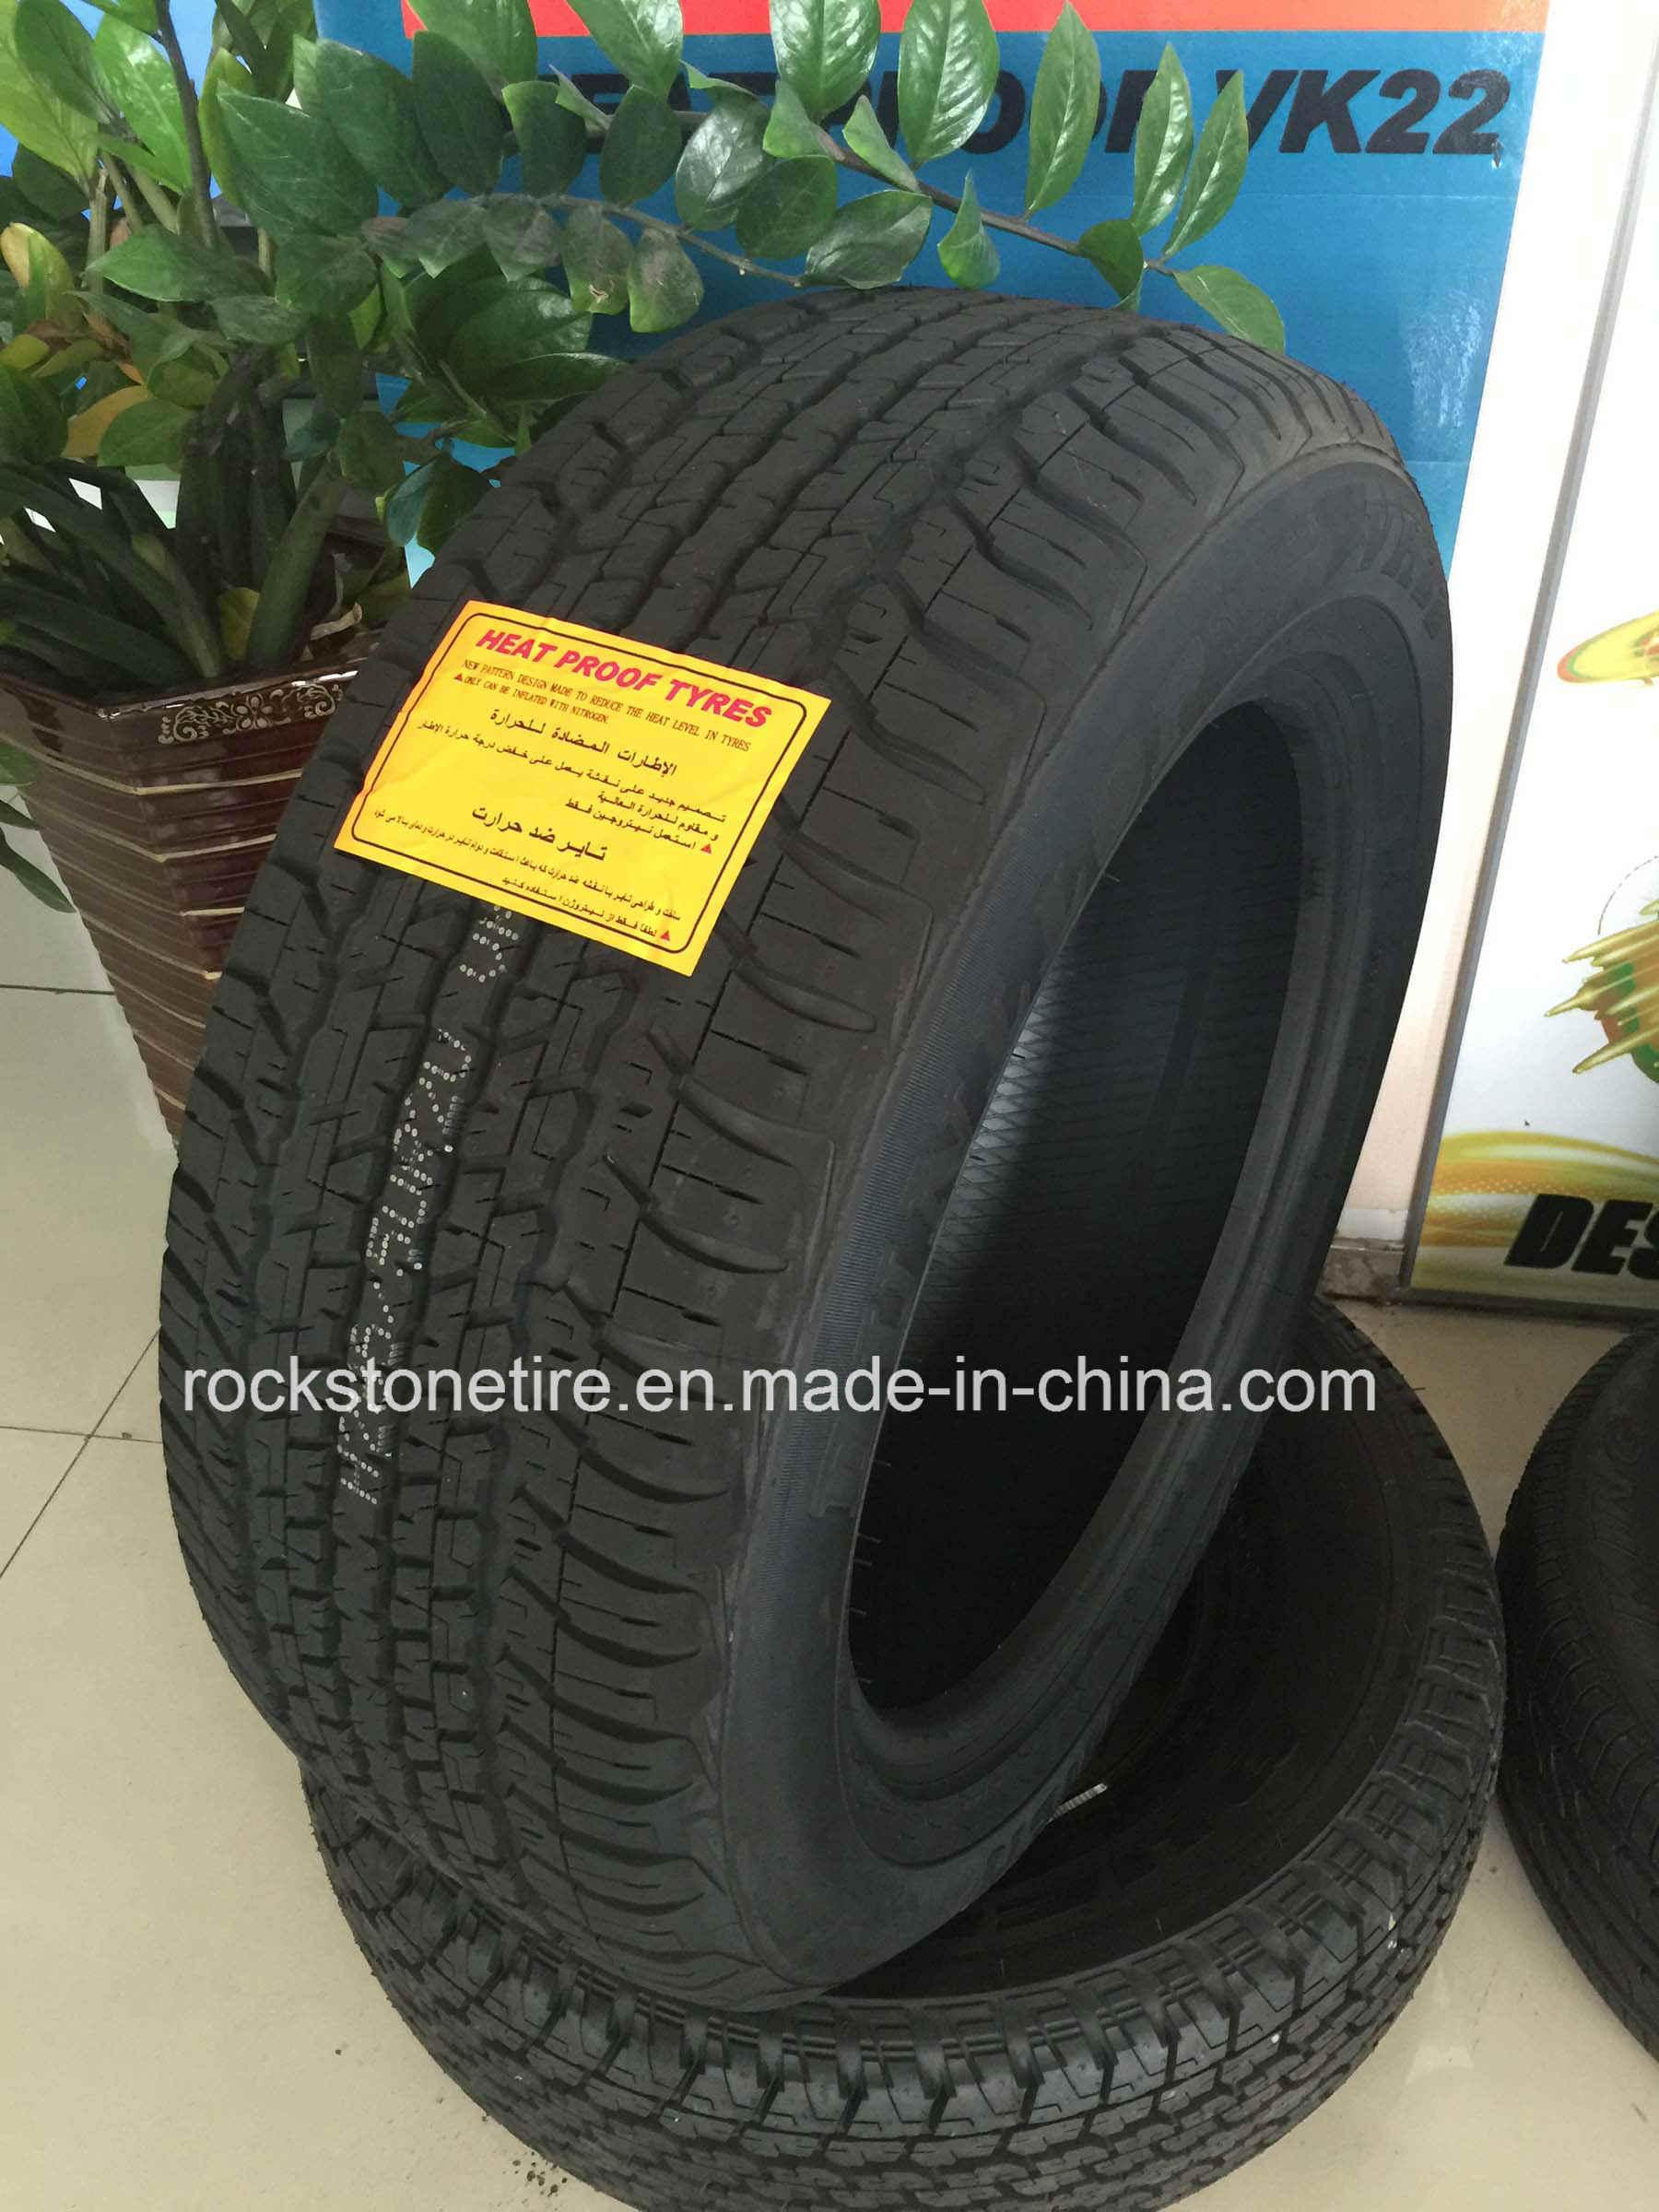 Tires 205 55R16 >> Hot Item Yokohama Tyres Continental Tires 205 55r16